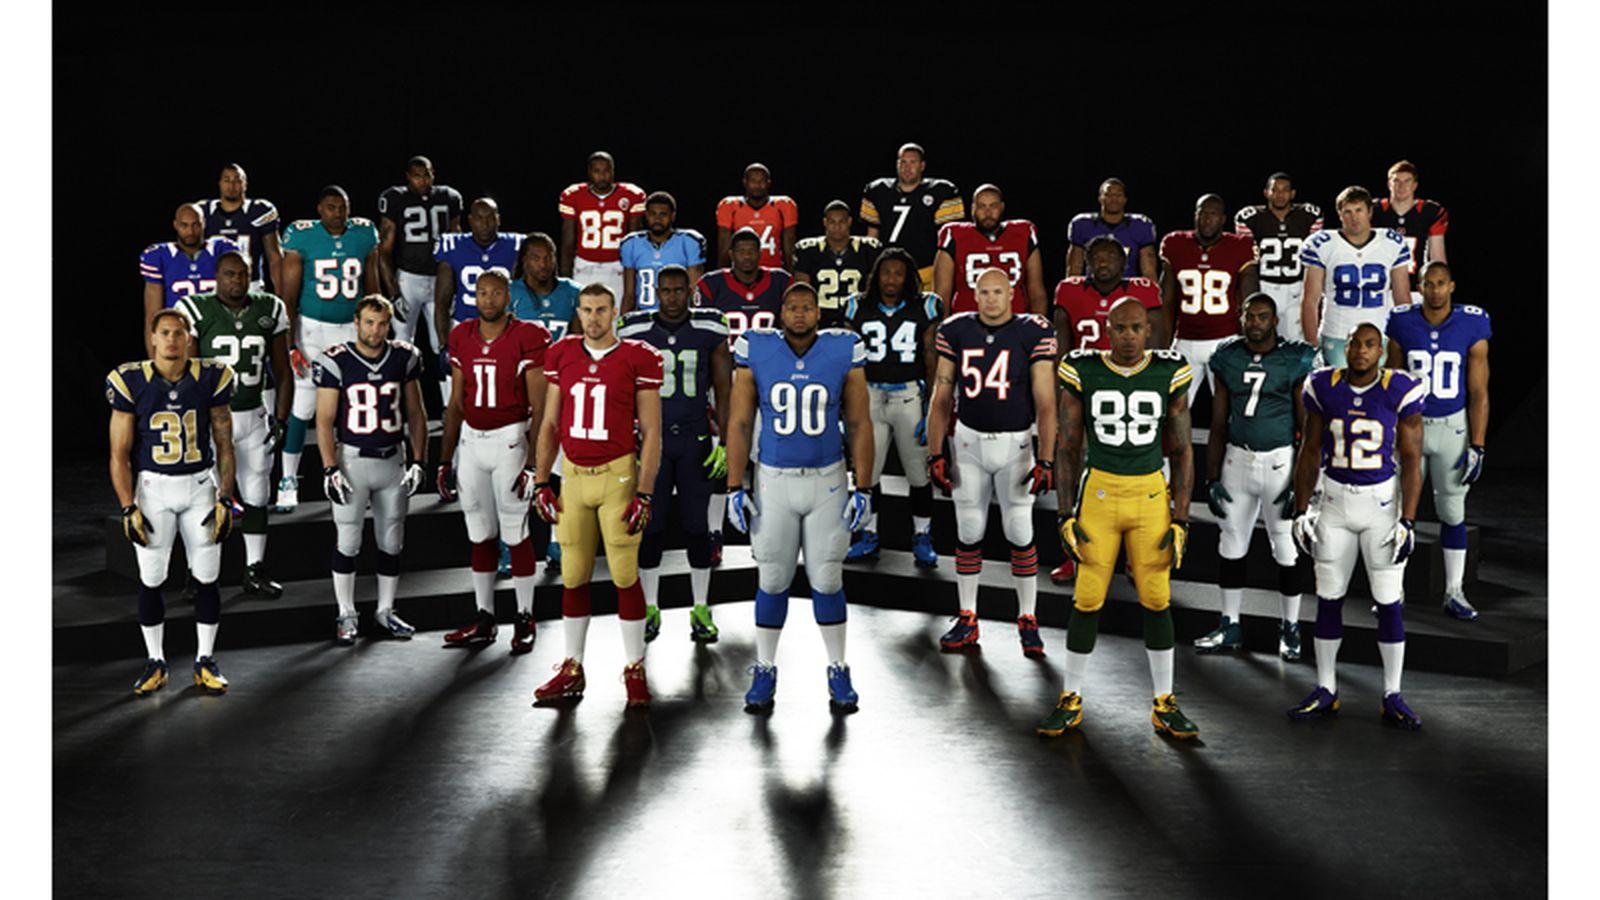 Nike Unveils New NFL Uniforms  Seahawks Only Drastic Change - SBNation.com 8b5d685b2